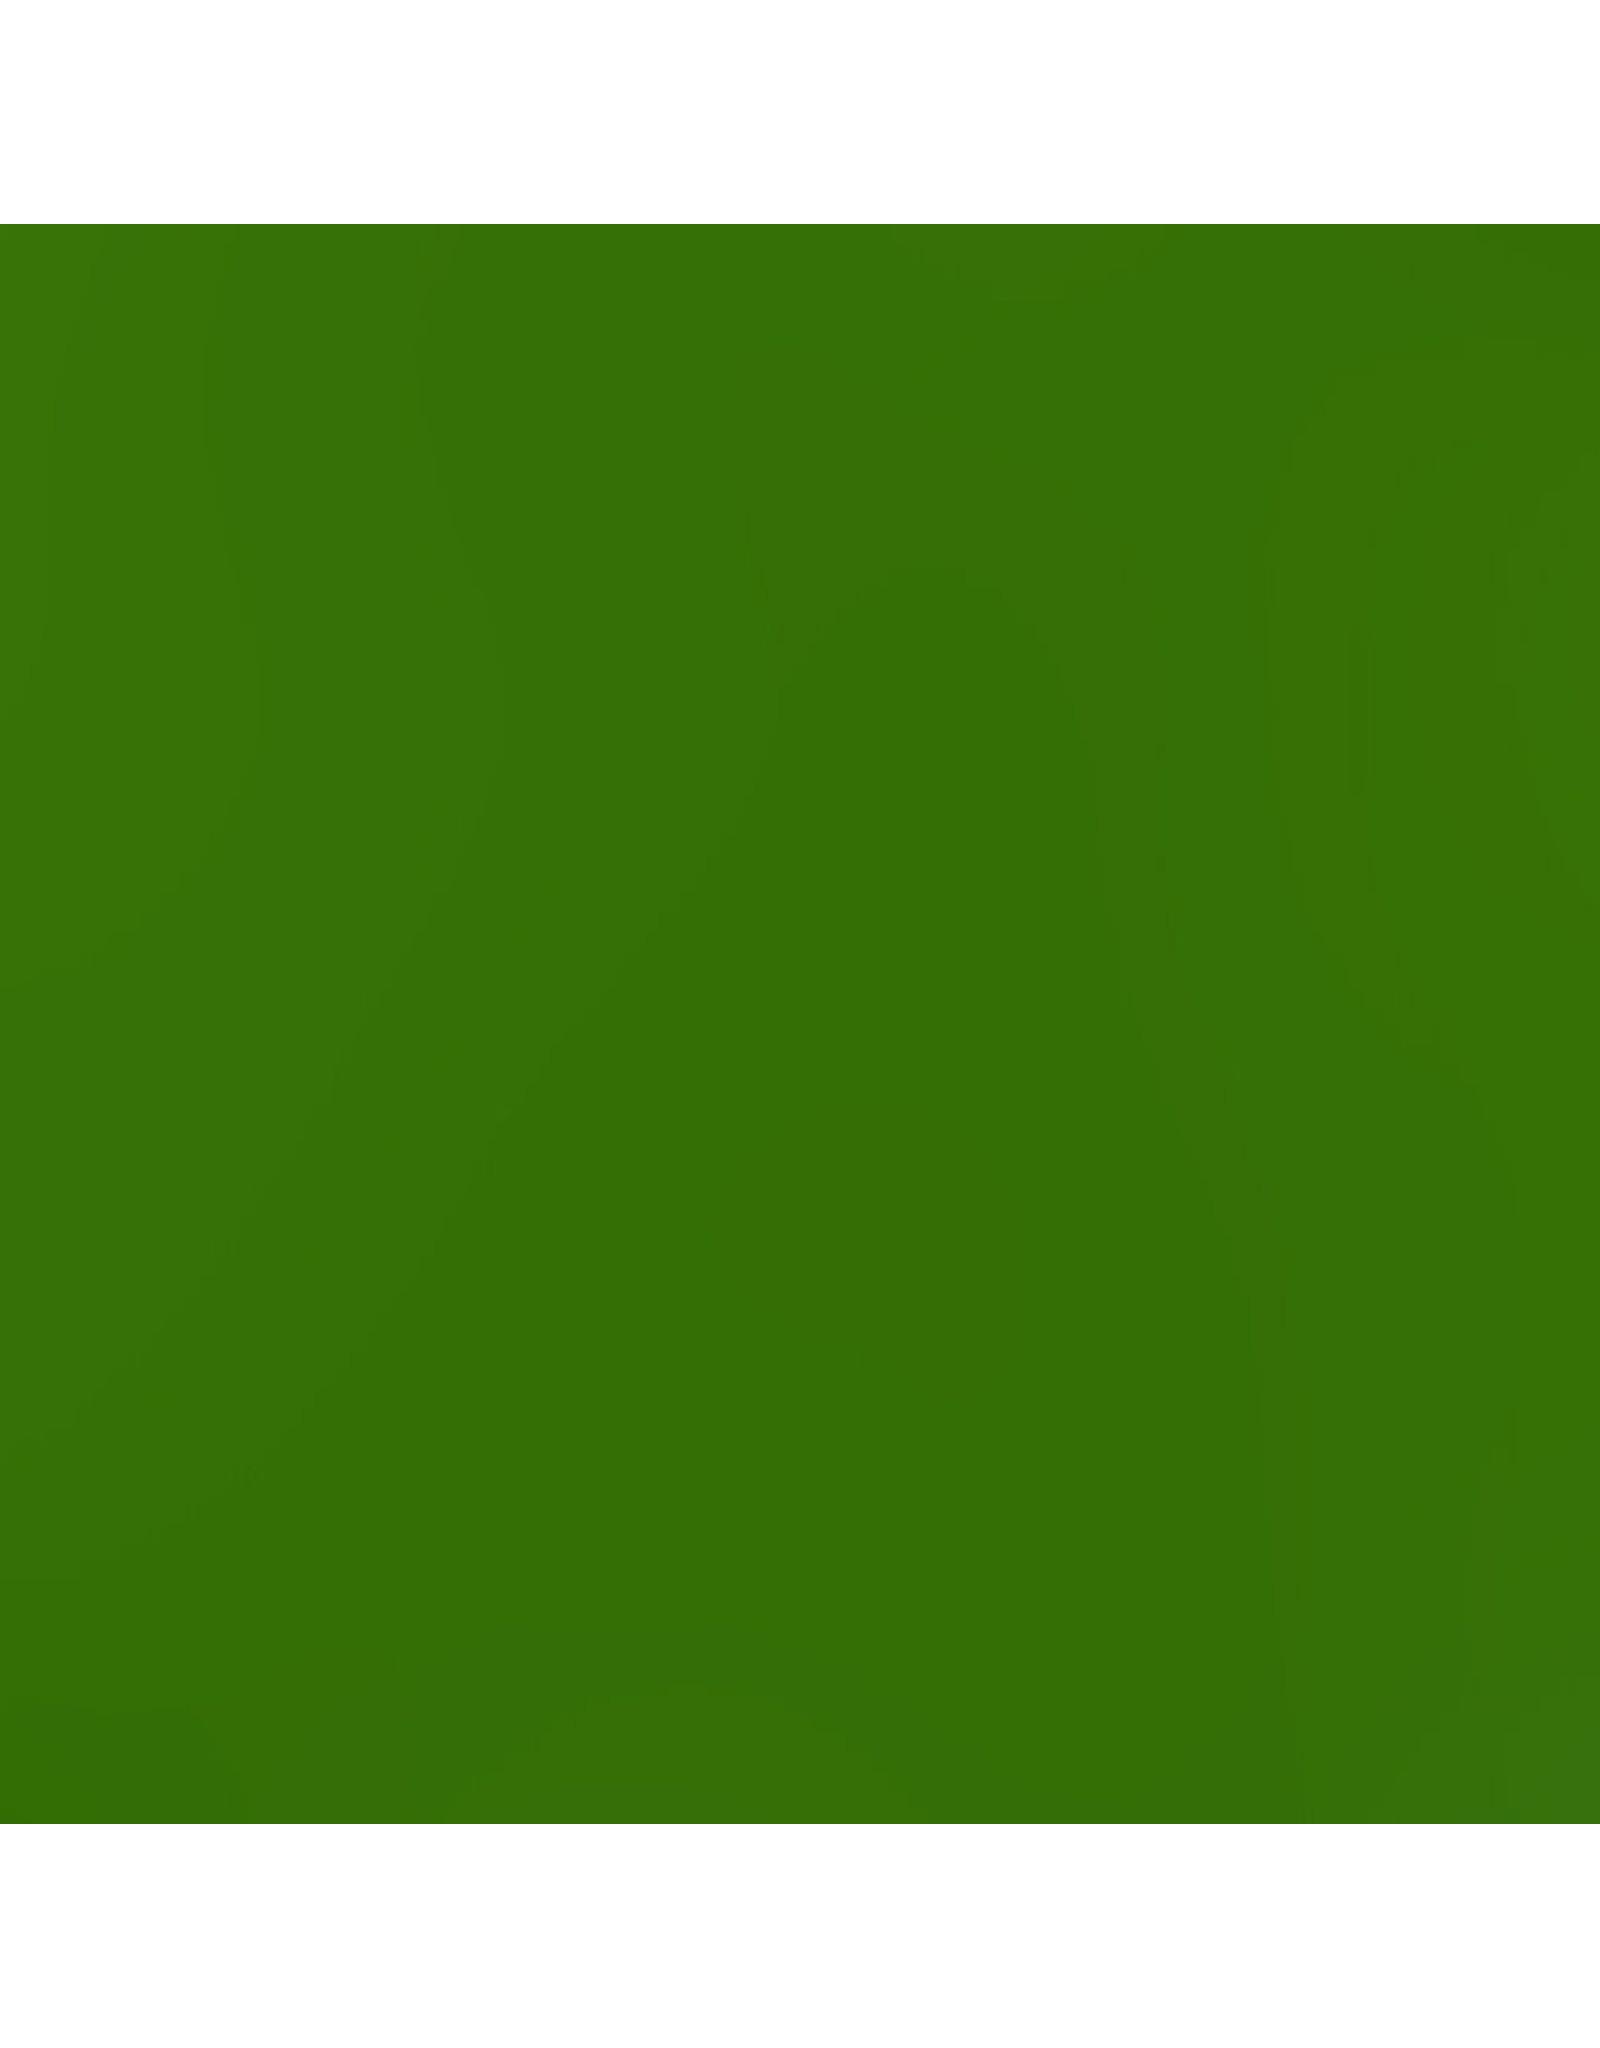 Bazzill Bazzill Card Shoppe 8.5x11 - Caramel Apple